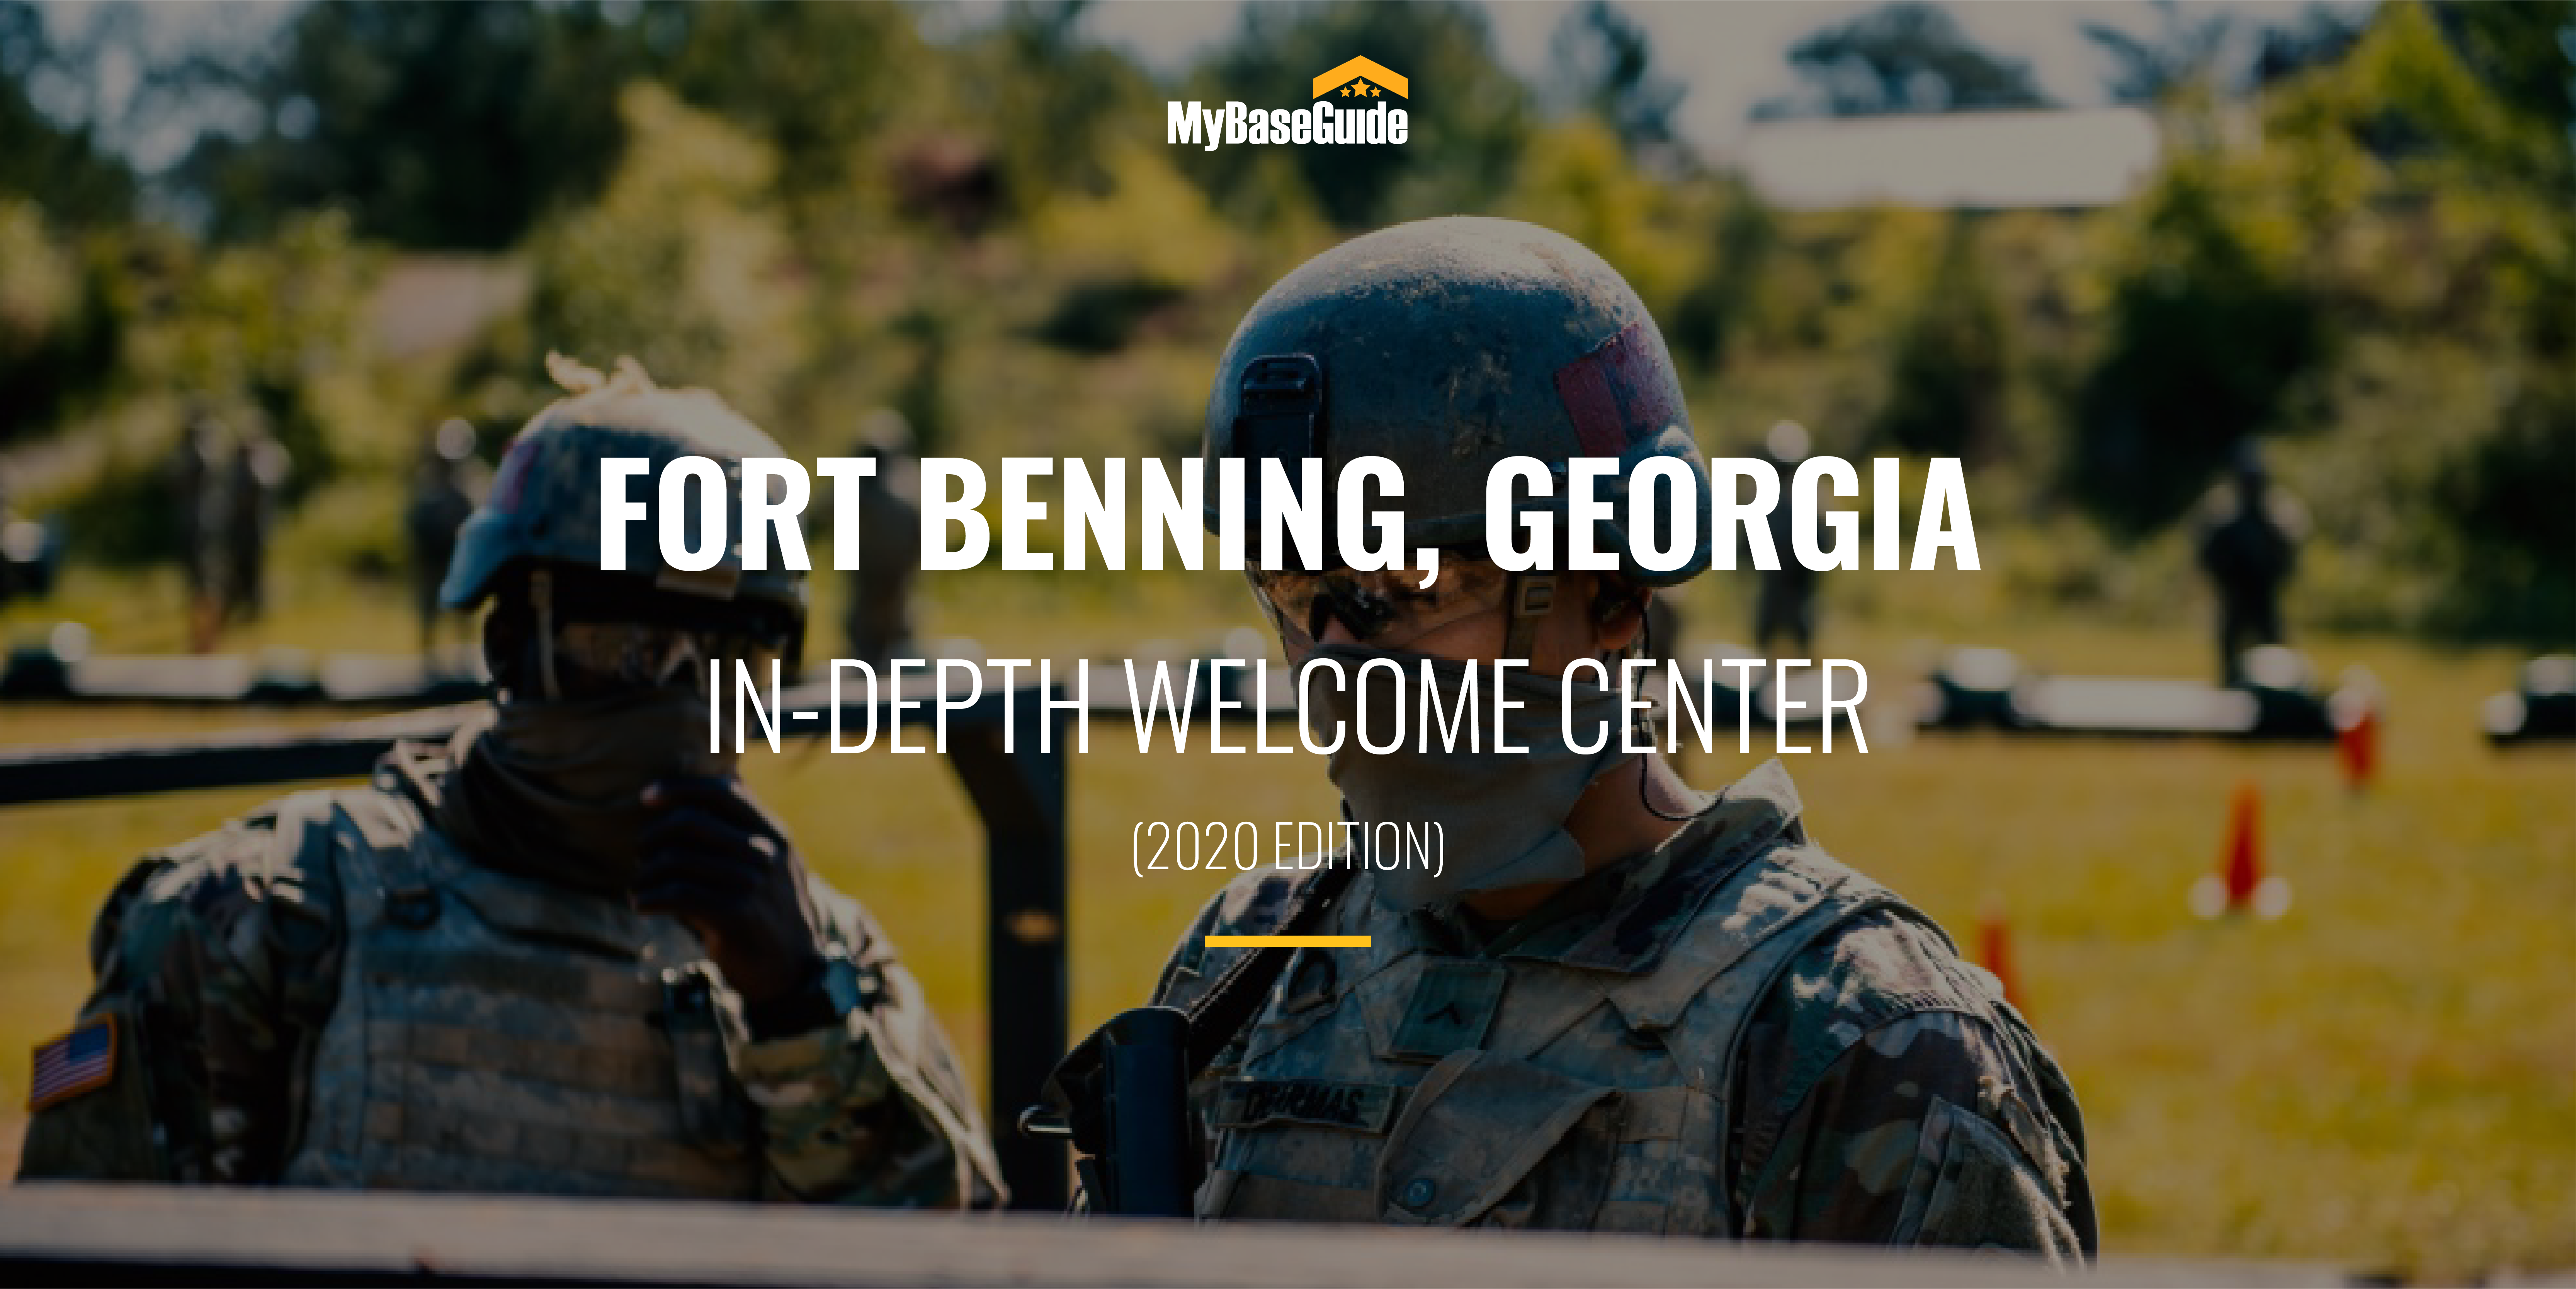 Fort Benning Georgia